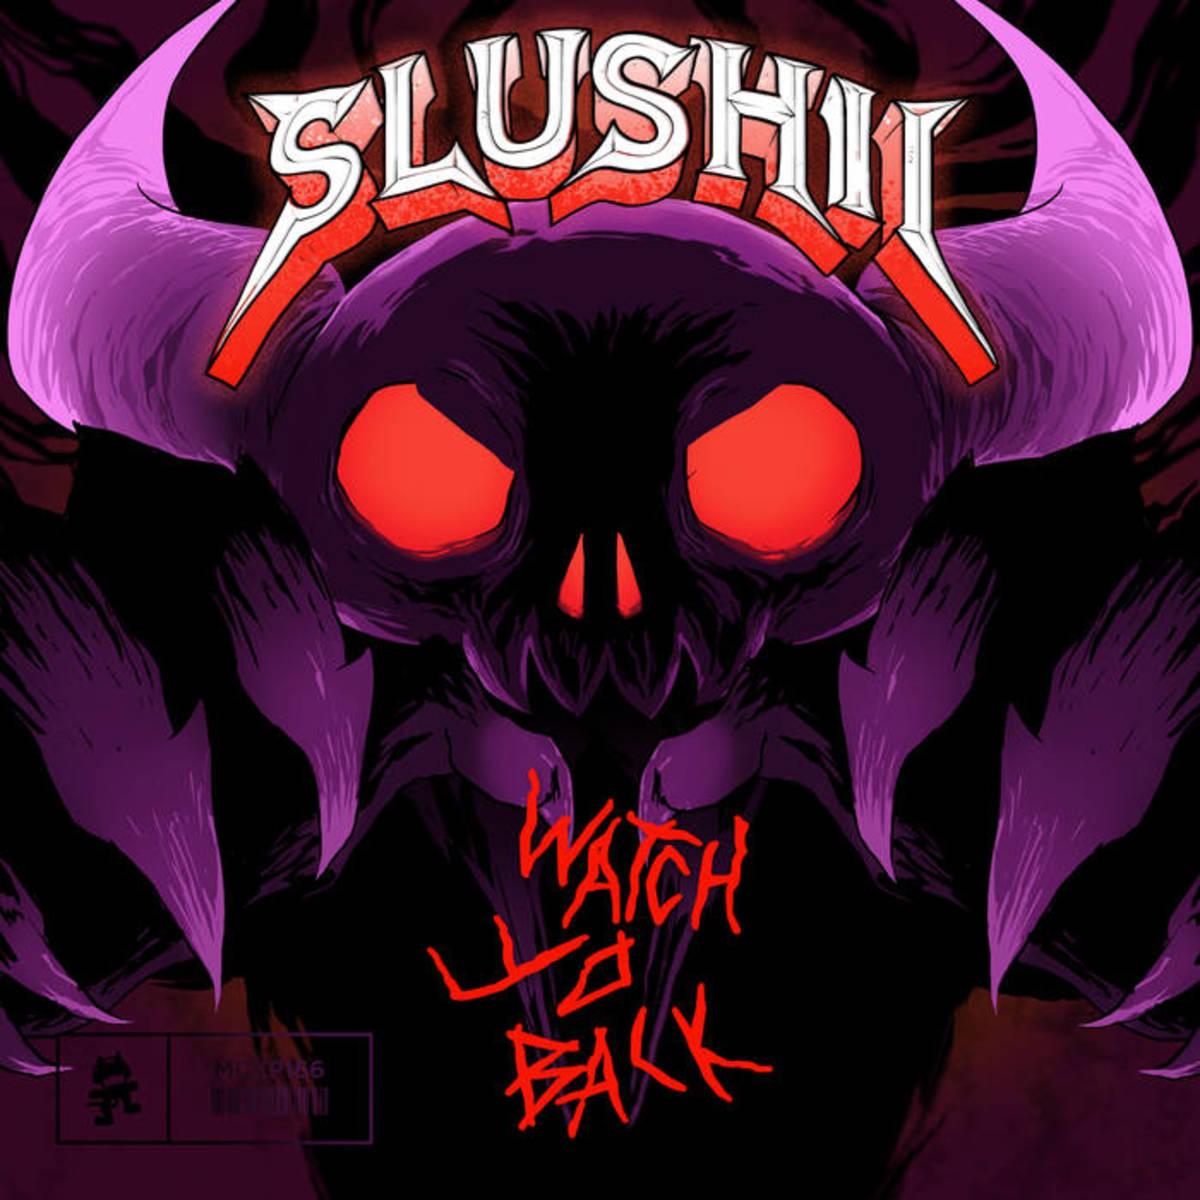 Slushii - Watch Yo Back (EP ALbum ARtwork)